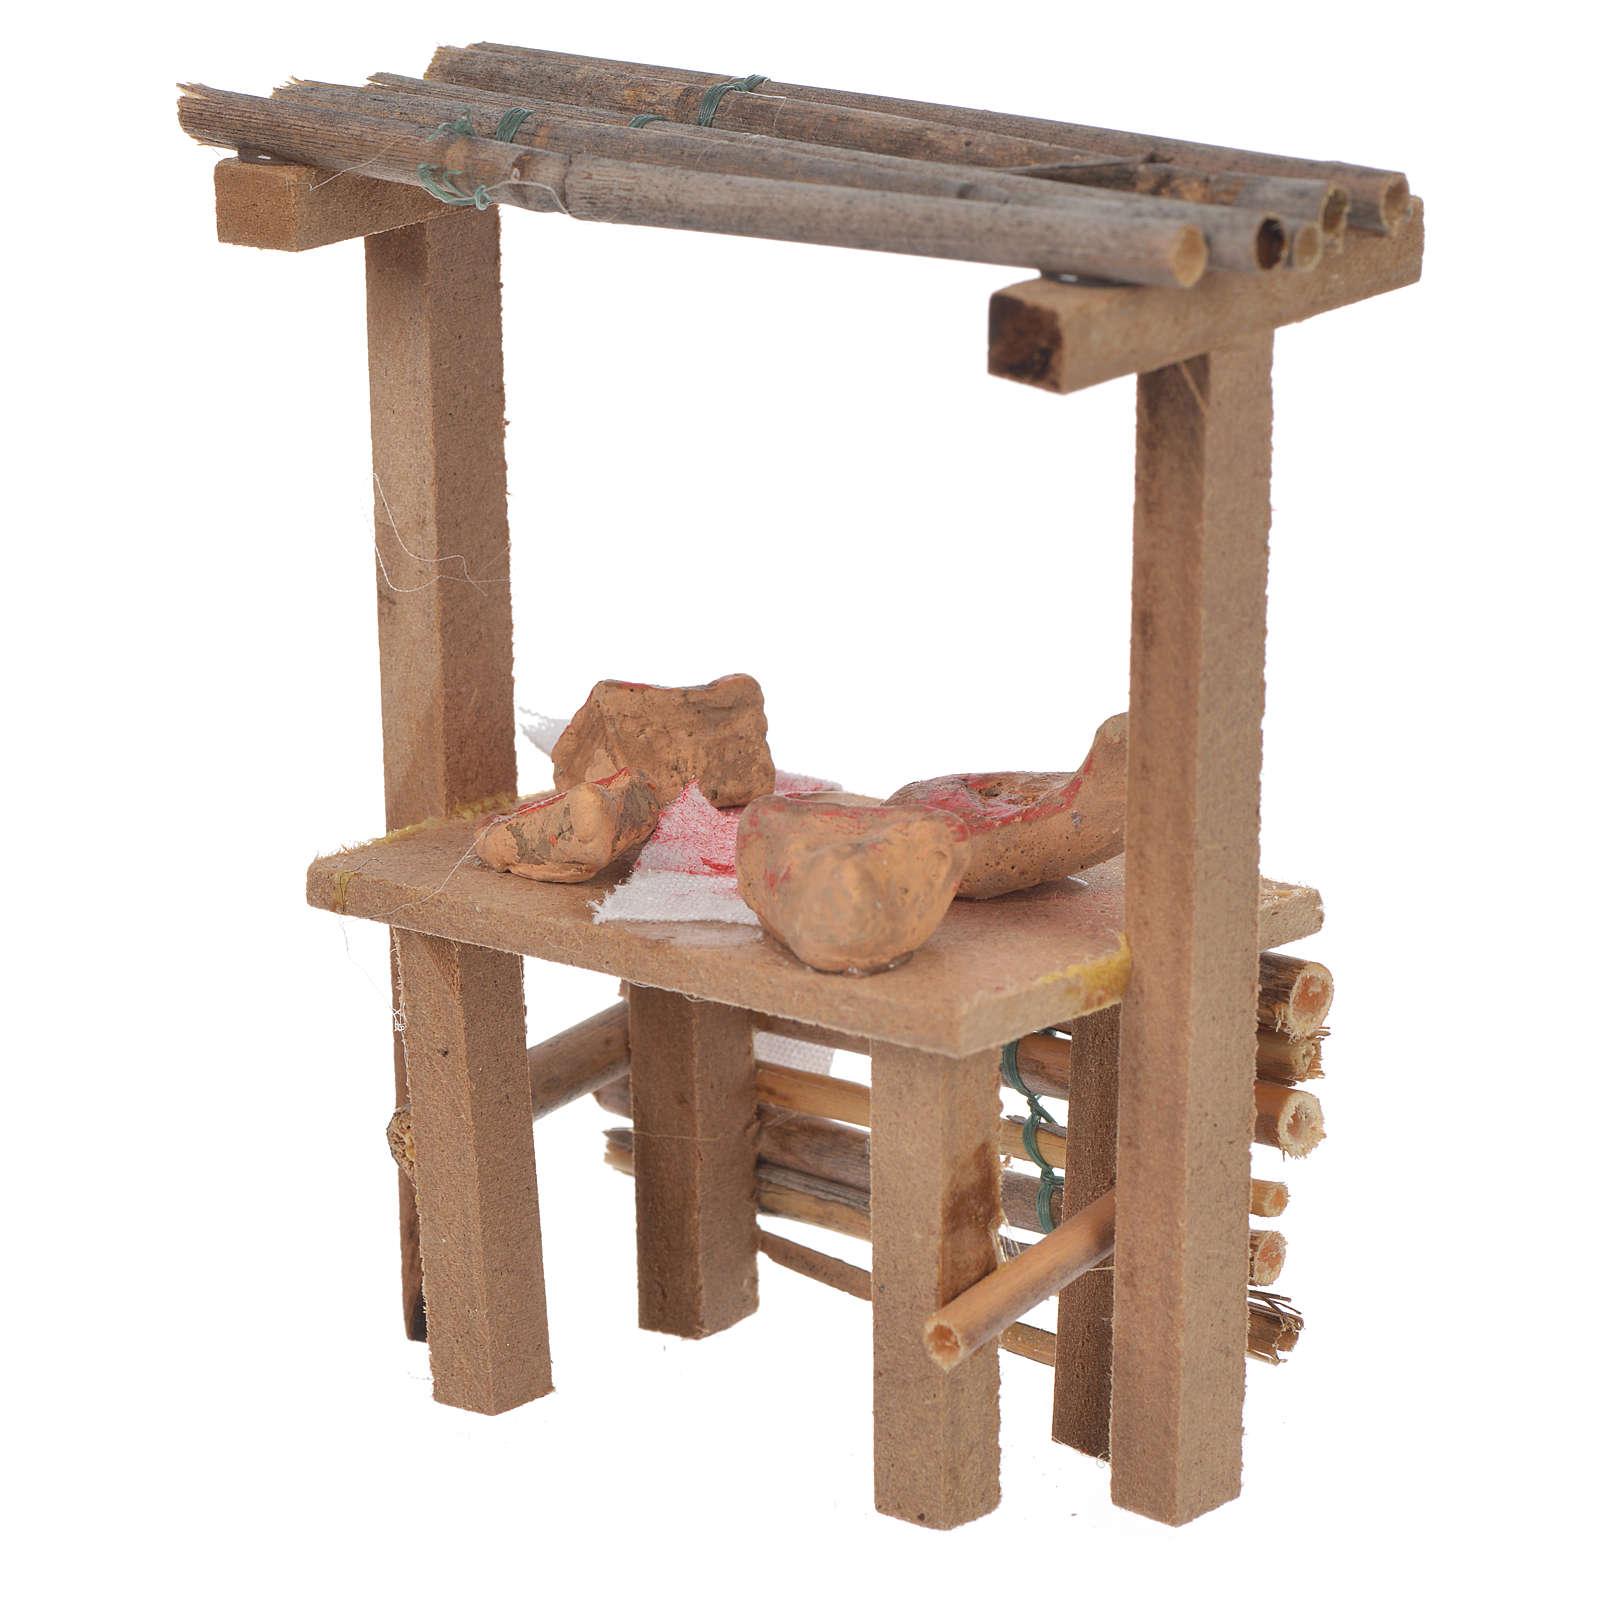 Banco legno salumi cera presepe 9x10x4,5 cm 4